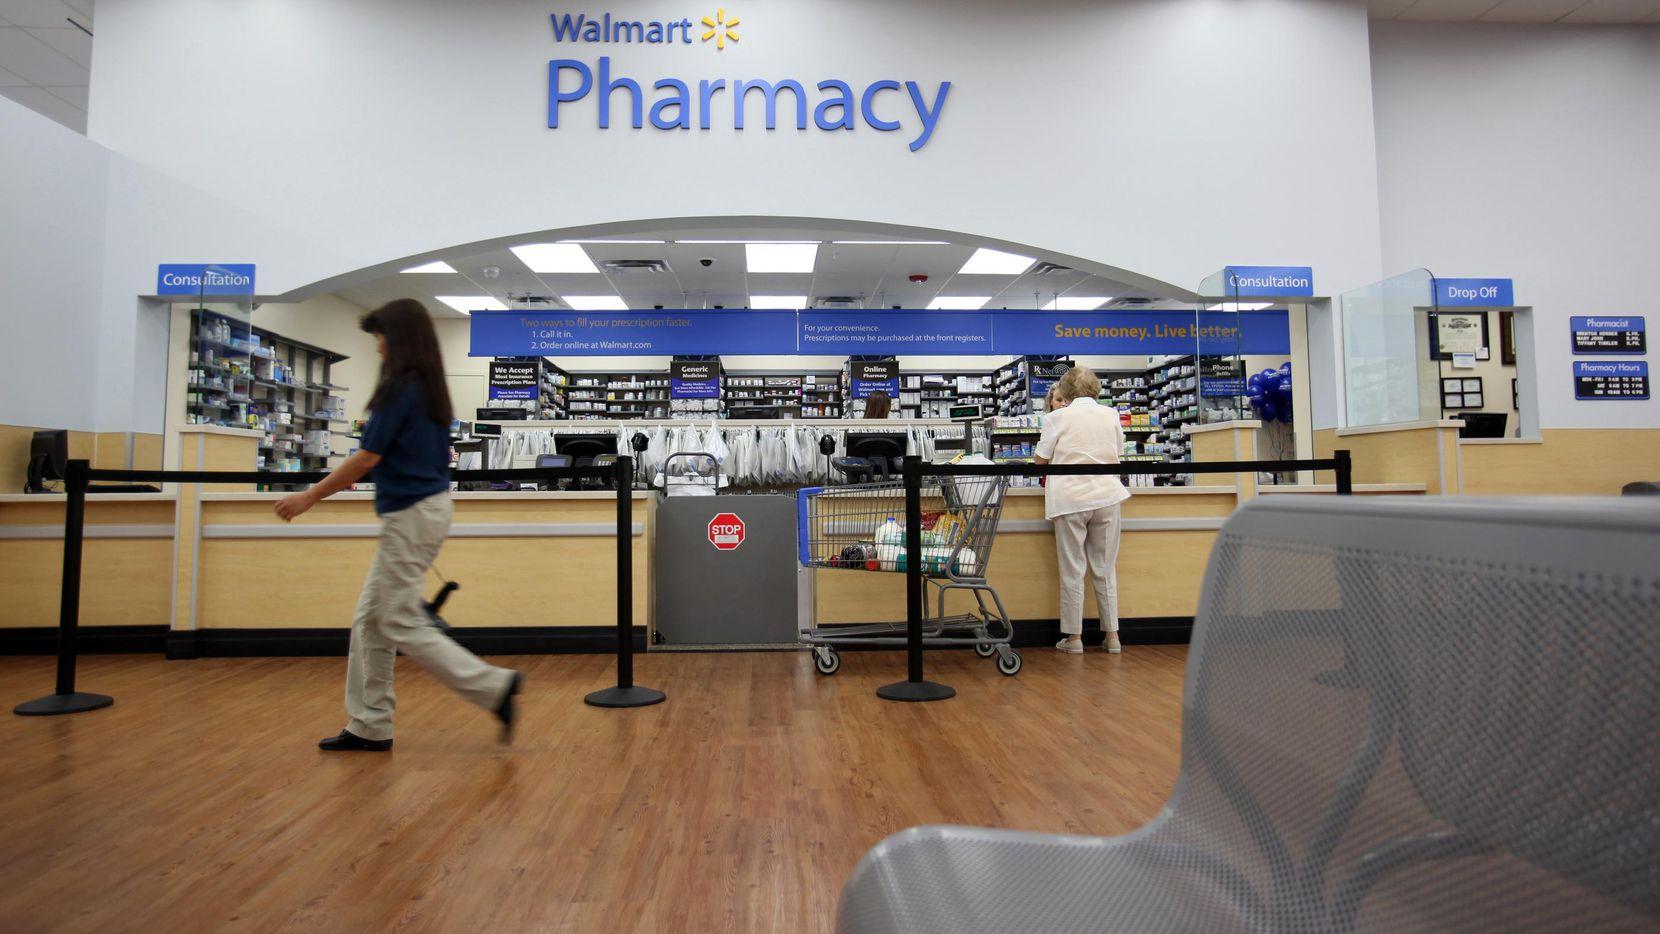 La farmacia dentro de un supermercado de Wal-Mart en Plano, Texas. (DMN/VERNON BRYANT)